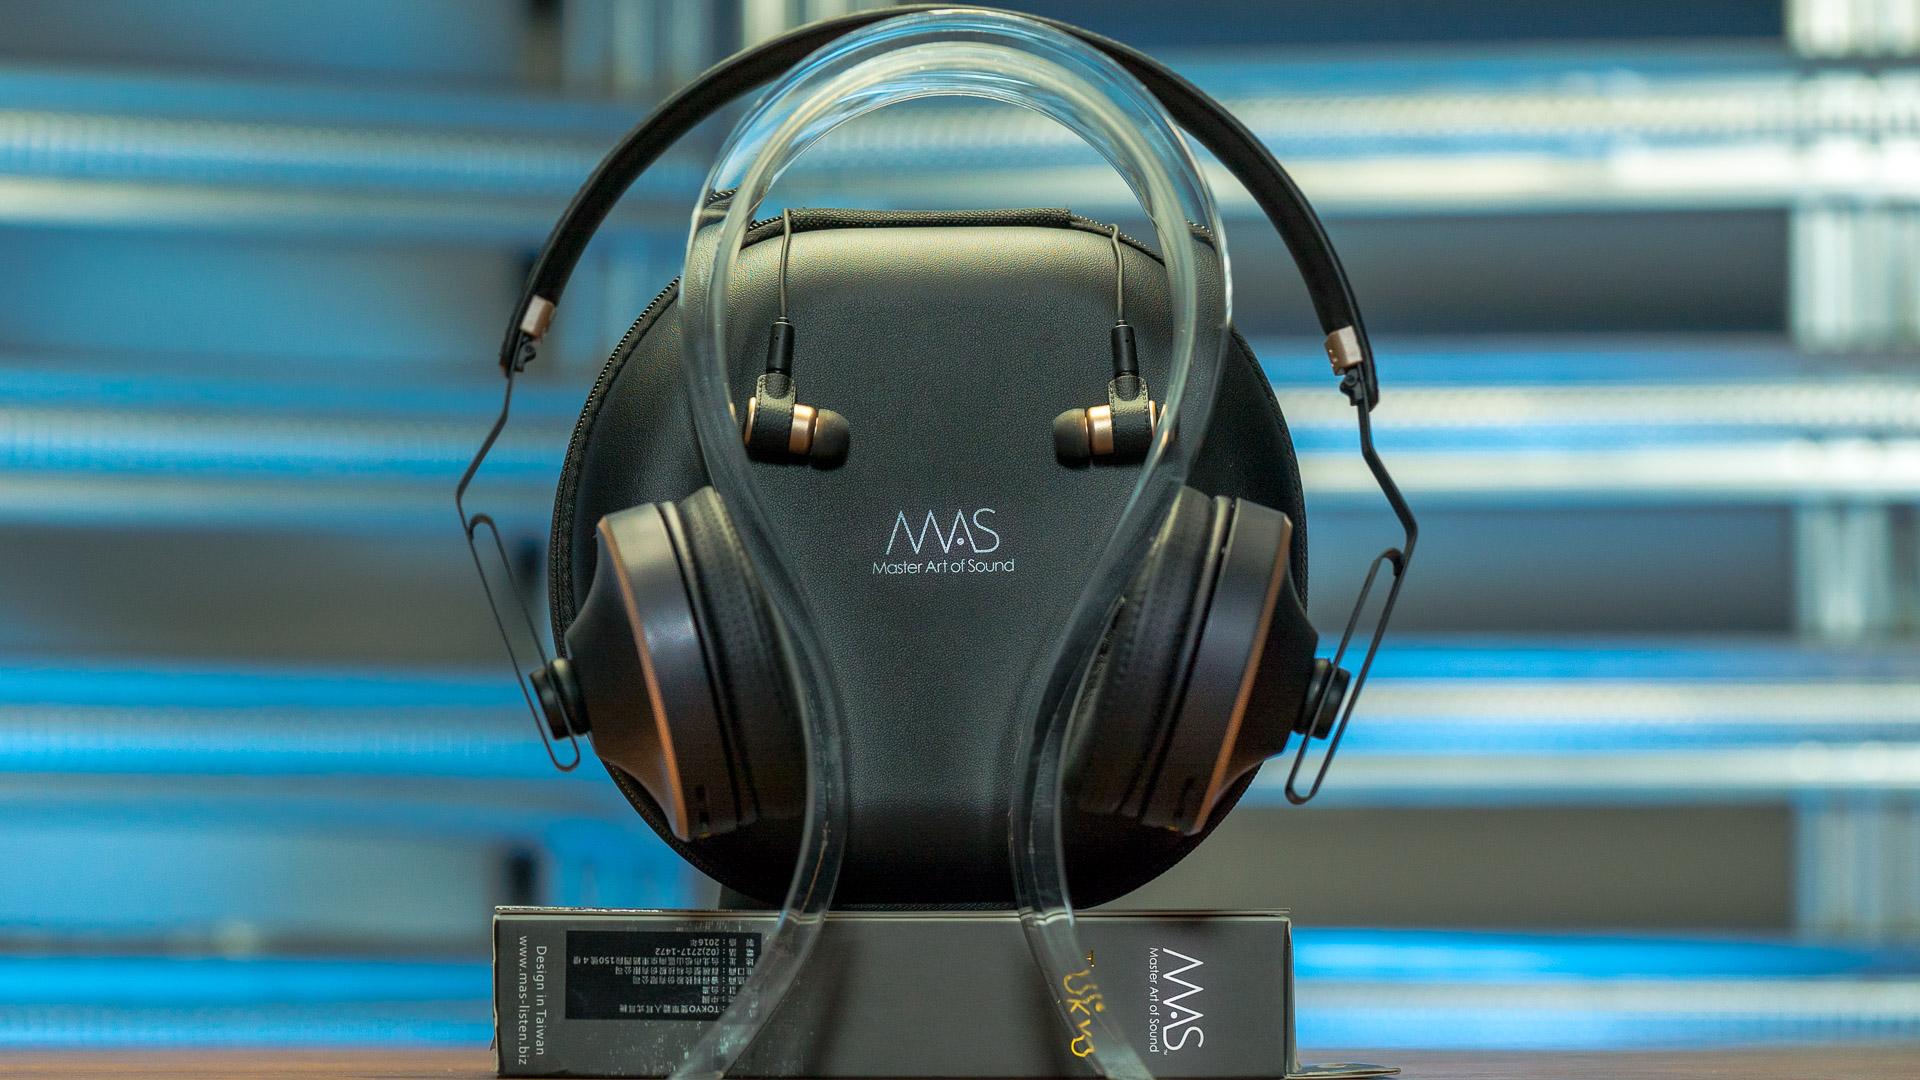 Headphones, Wireless Bluetooth Earbuds - Newegg.com